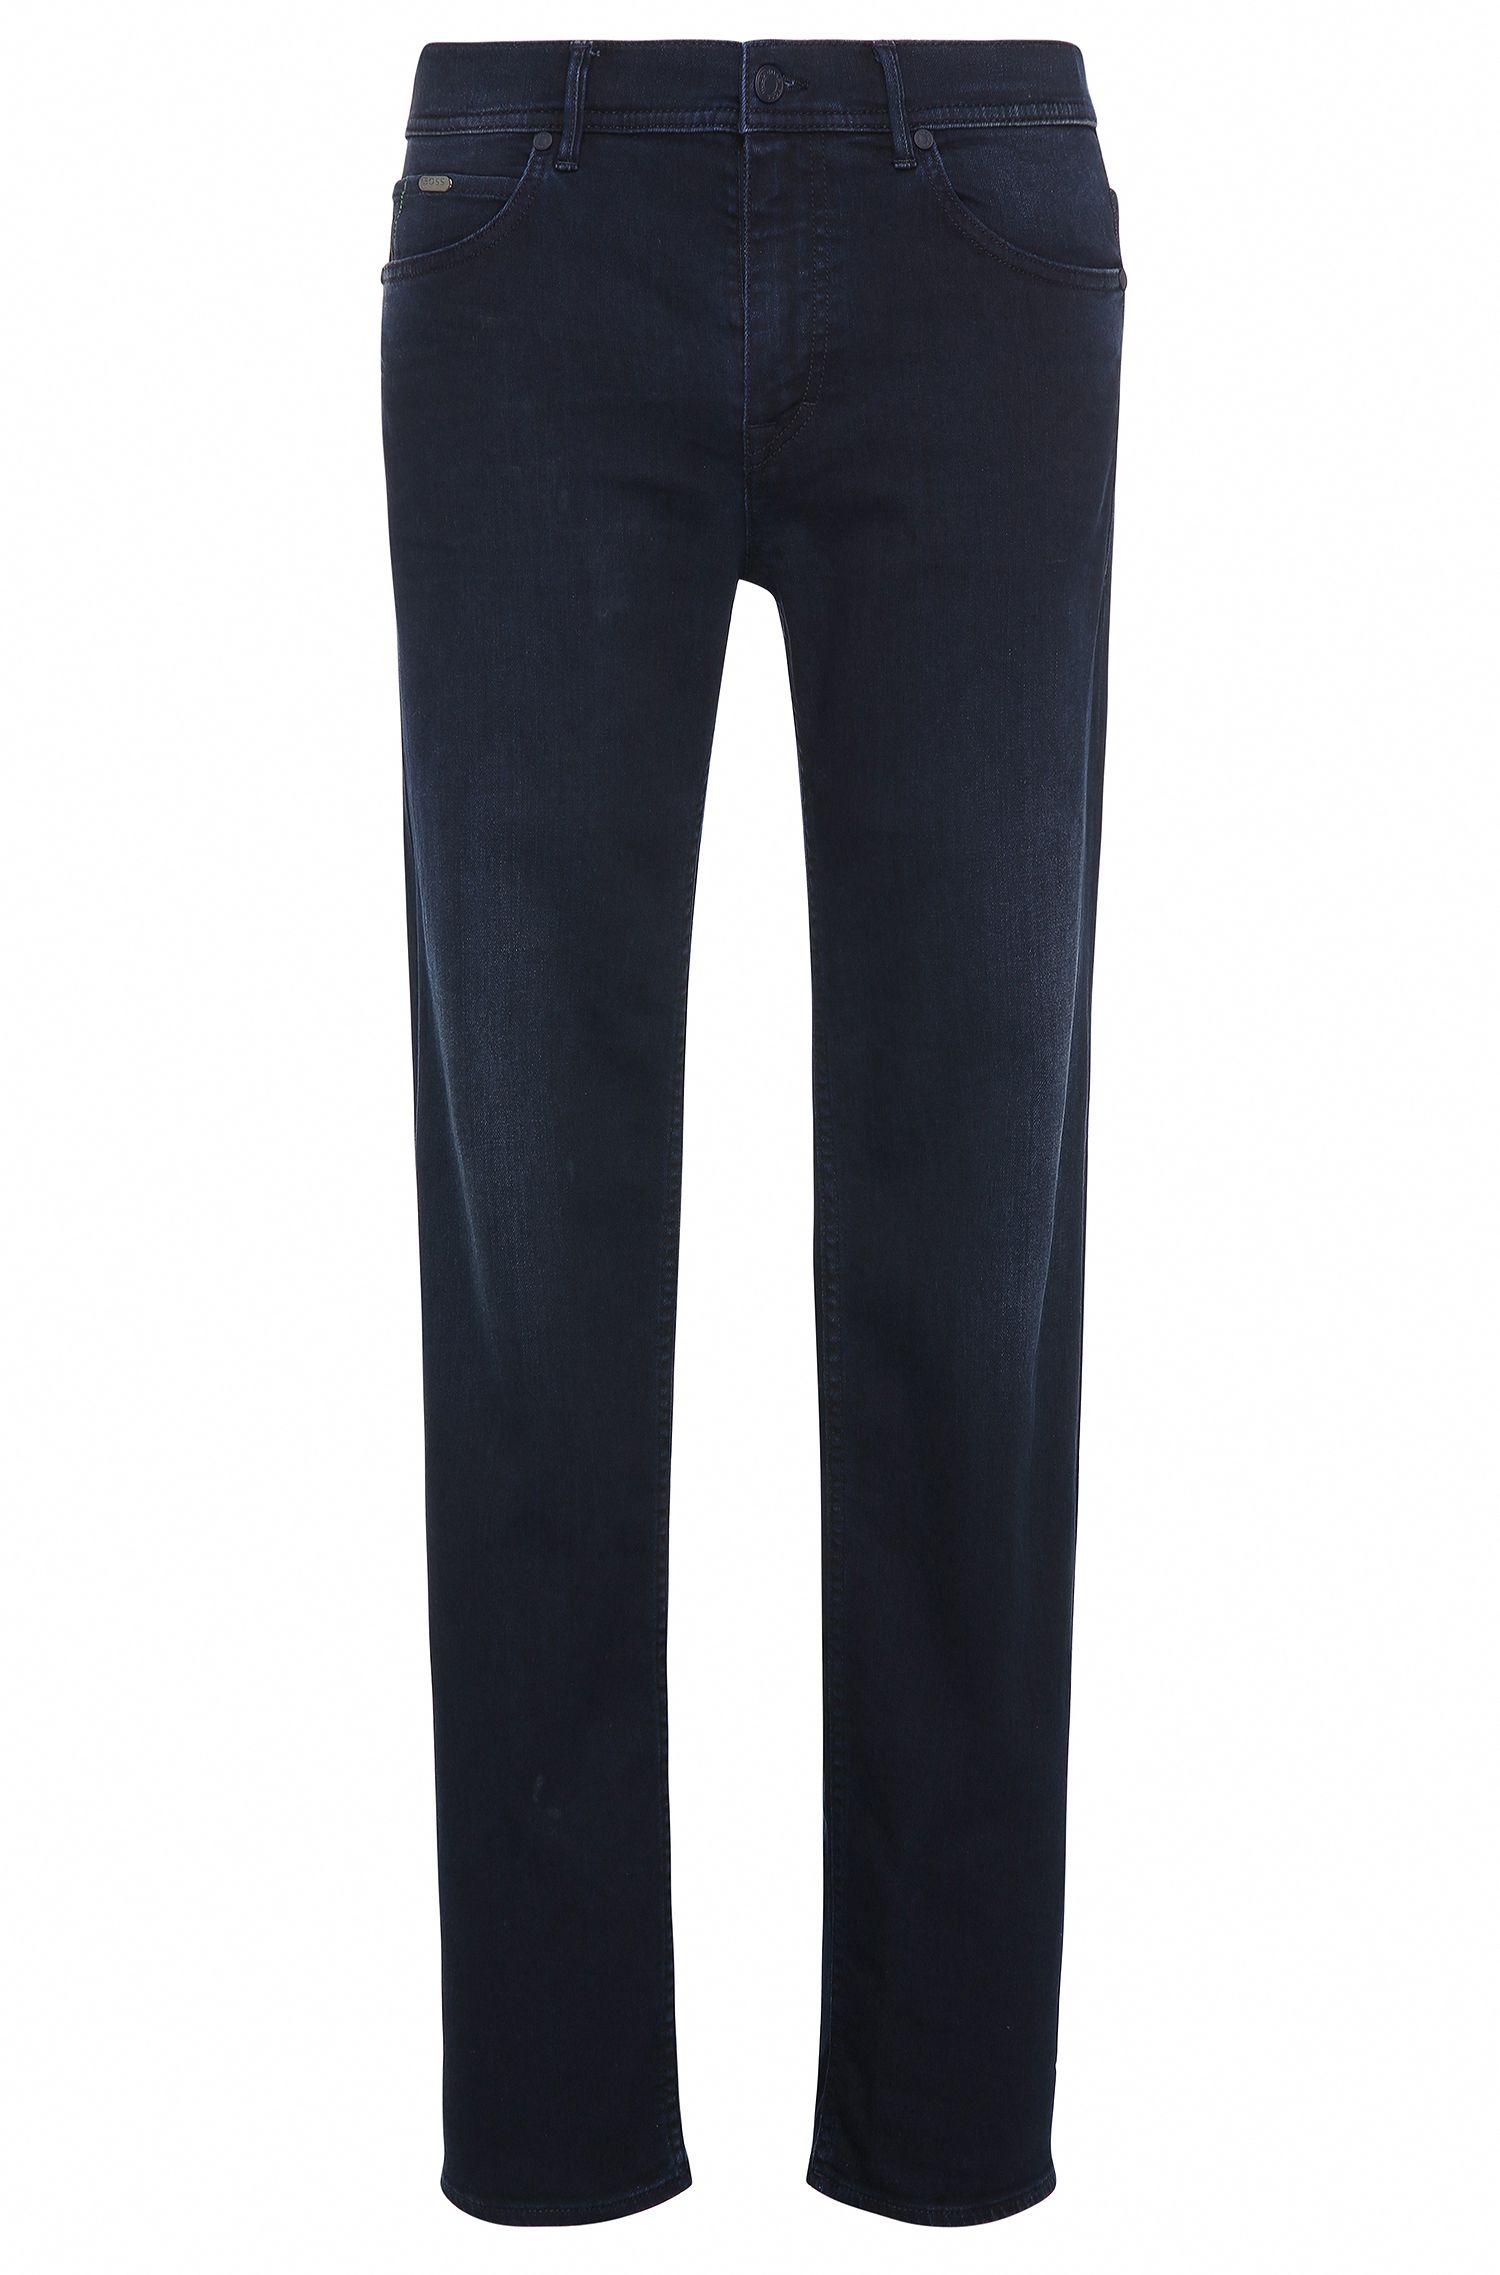 10 oz Stretch Cotton Blend Jeans, Regular Fit   Dream30